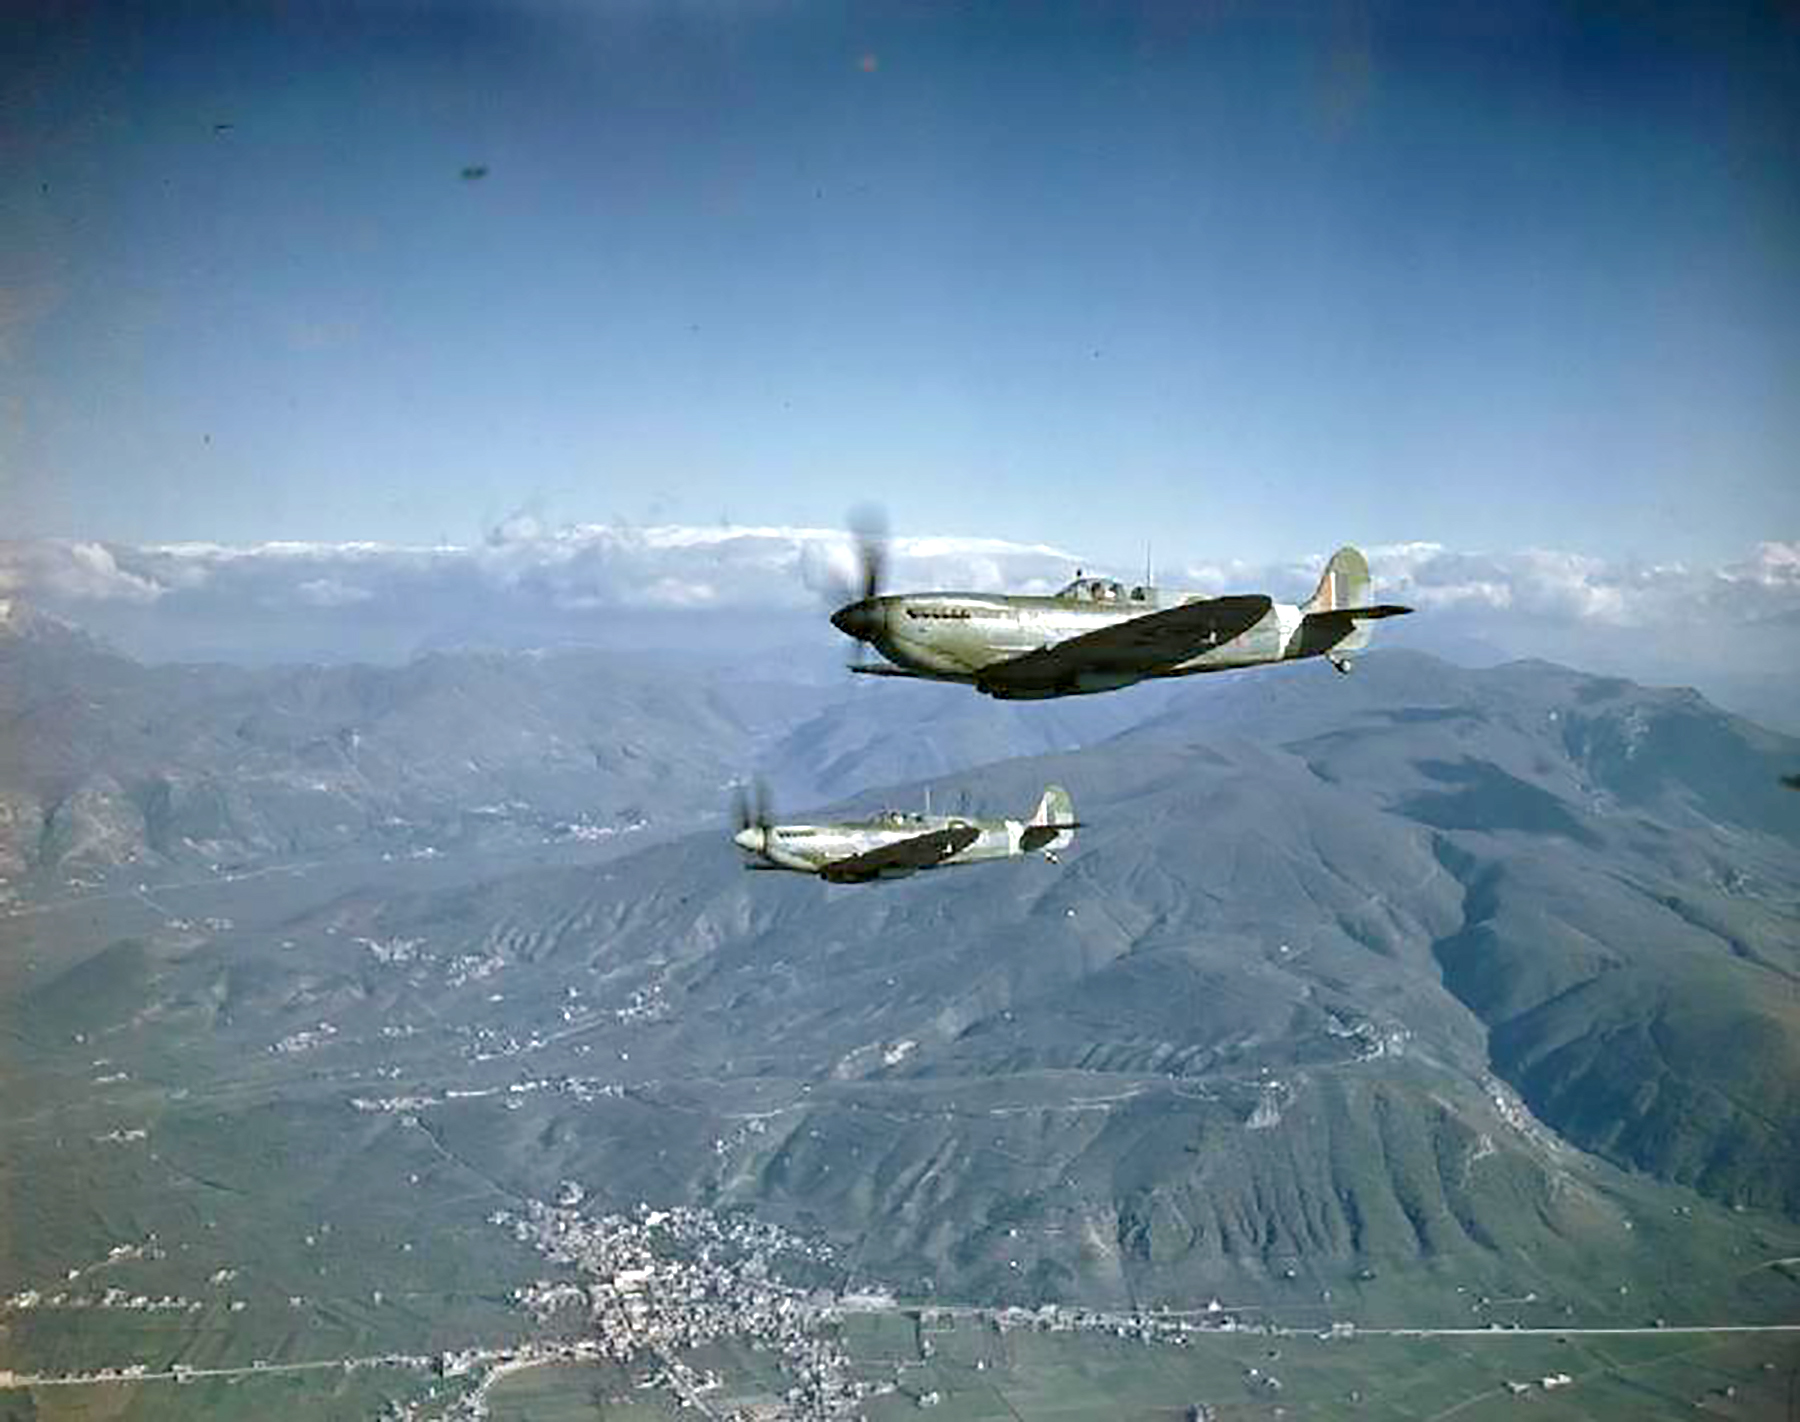 Spitfire MkIXs RAF 241Sqn RZR H Cogman MA425 RZ U JV Macdonald MH635 over Rome IWM 02